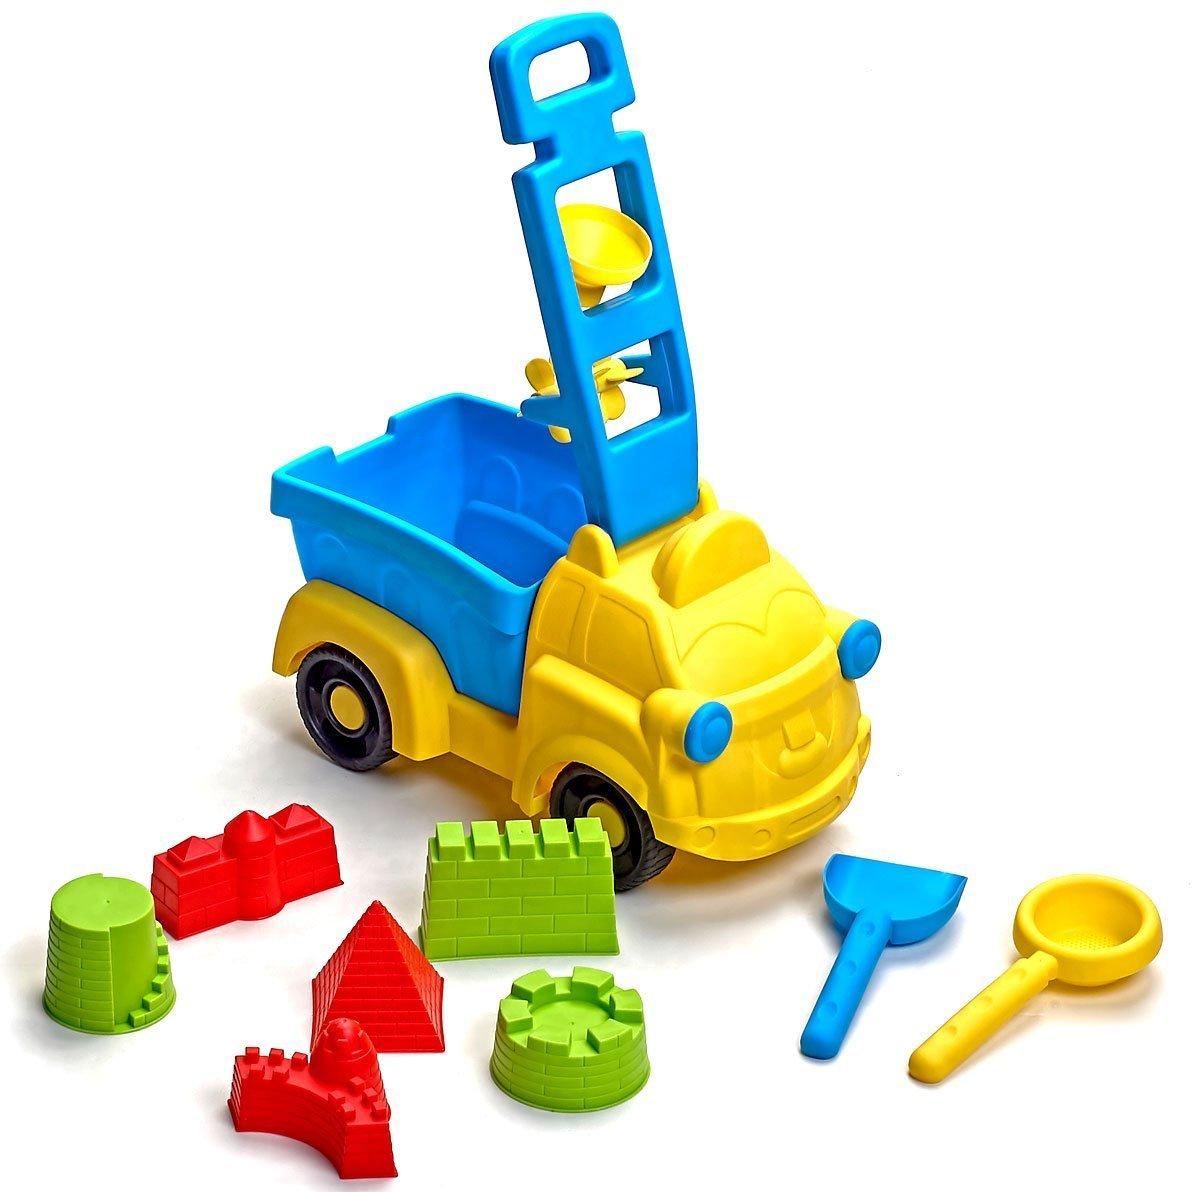 Beach Toys Deluxe Set 9 pieces Large Dump Truck Sand Molds Set bo toys